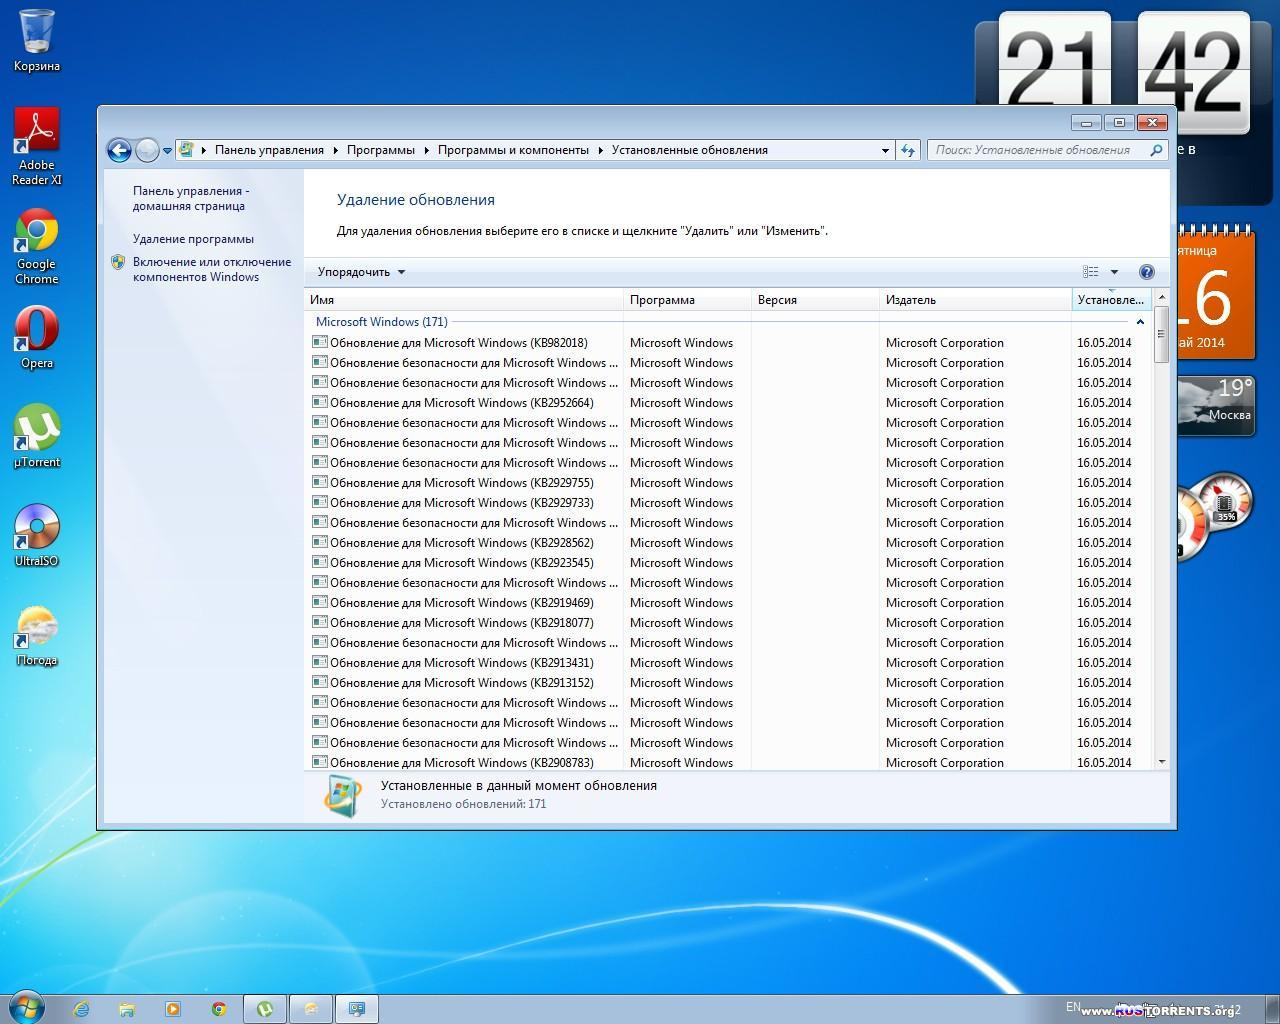 Windows 7 Ultimate SP1 �86/�64 by Loginvovchyk 05.2014 RUS